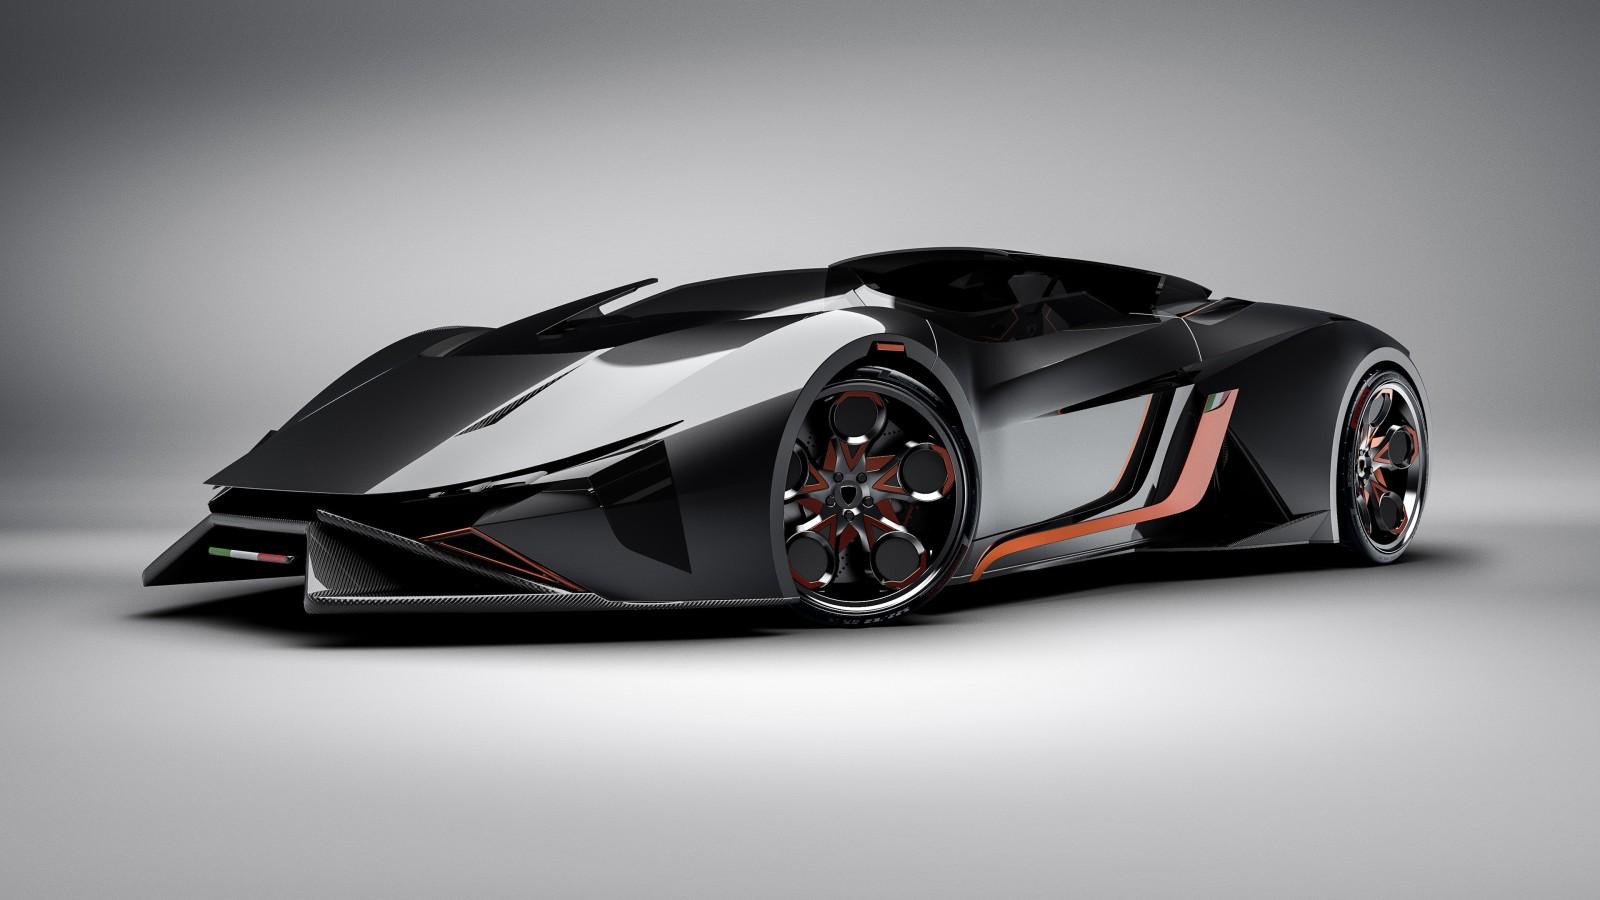 8k Car Wallpaper Download Lamborghini Diamante Concept Car 4k Wallpaper Hd Car